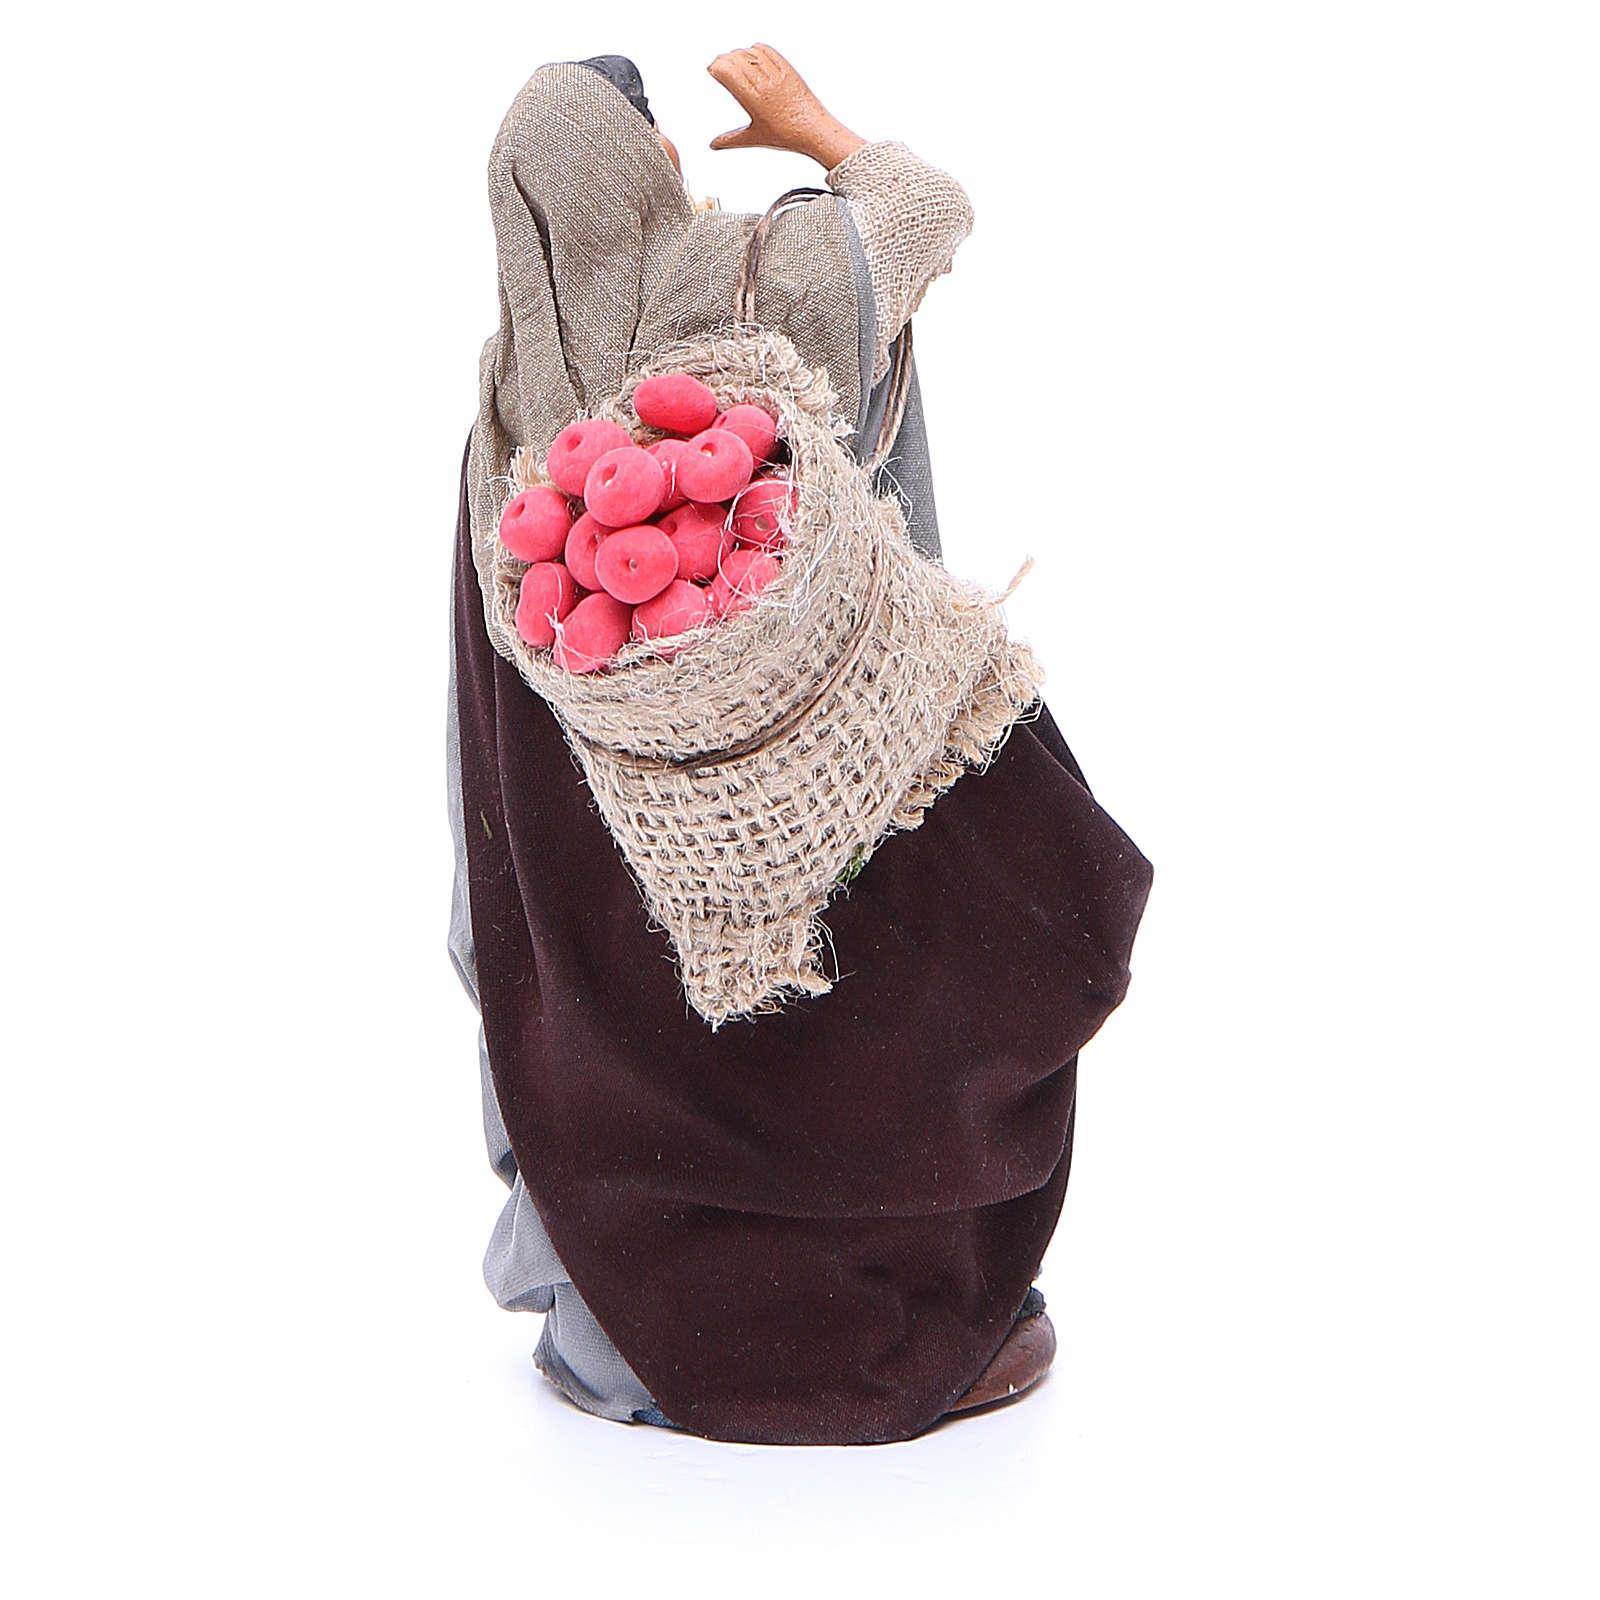 Donna sacco mele e ceppo in mano 14 cm presepe Napoli 4